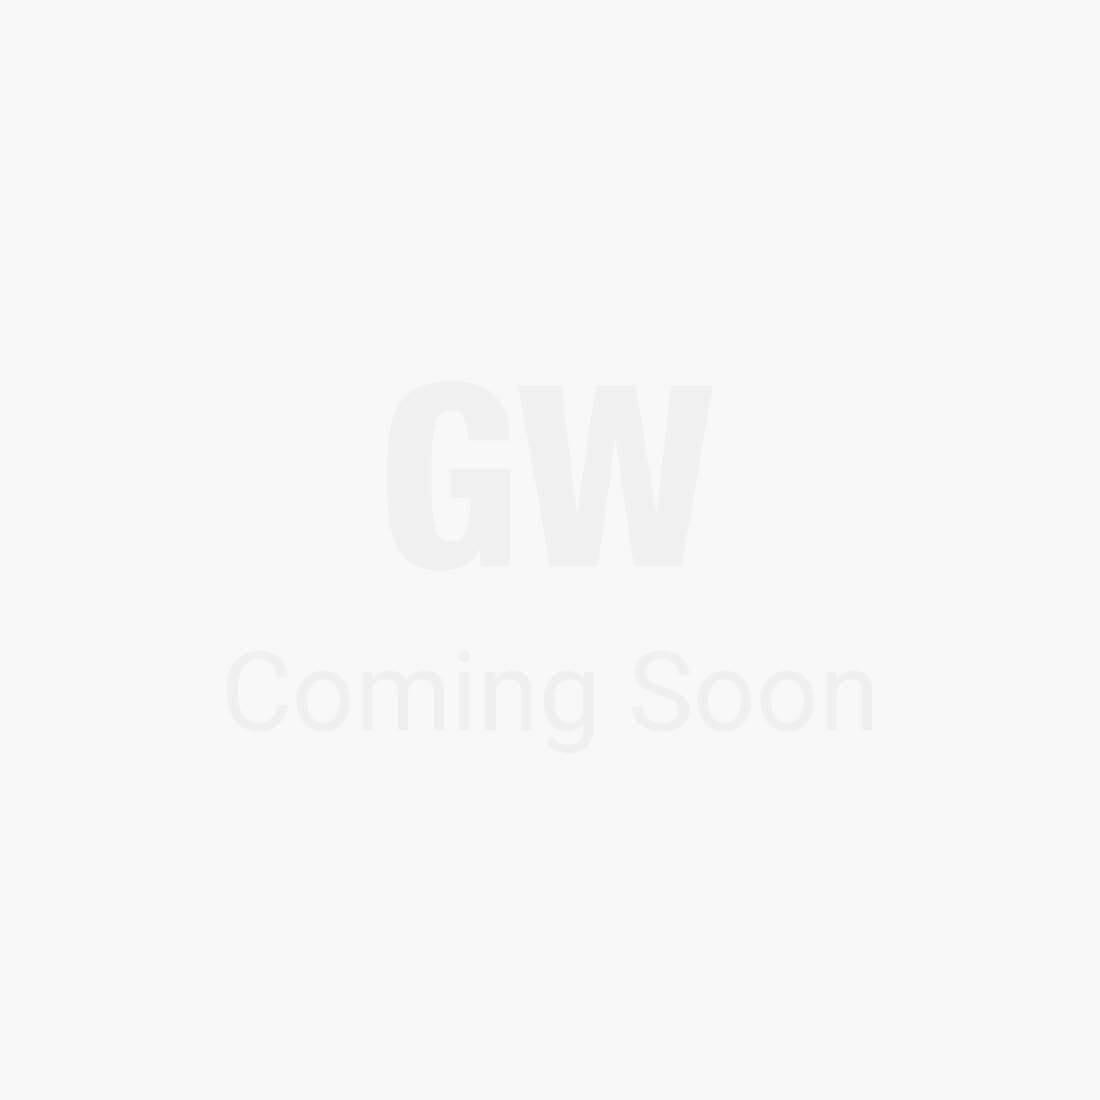 Hugo Arc Occasional Chair